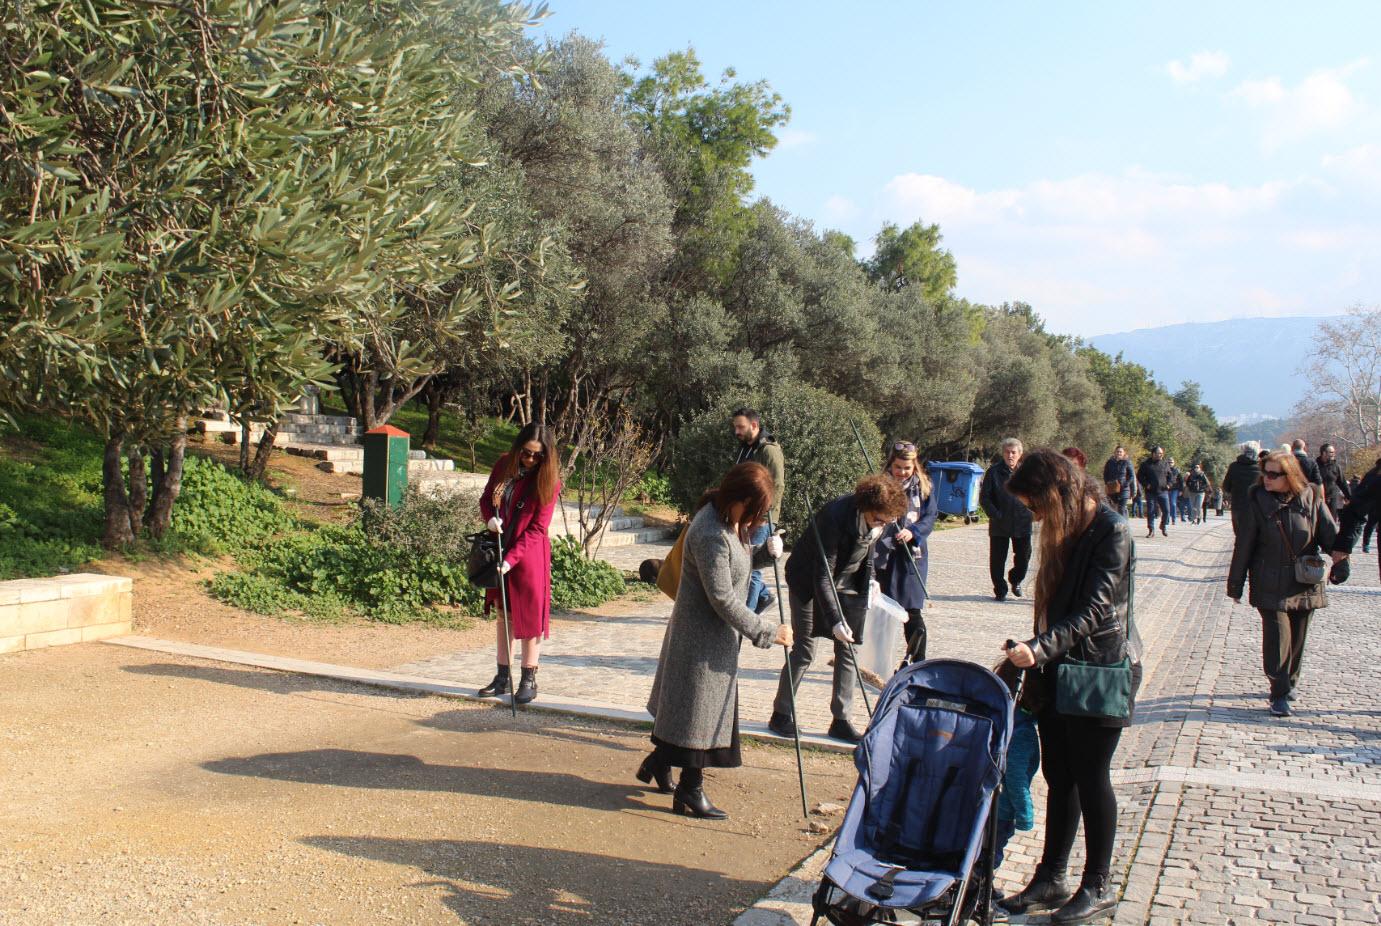 Cigaret Cycle: Καθαρισμός Δ. Αεροπαγίτου από αποτσίγαρα – Συνάντηση με Δήμαρχο Αθηναίων